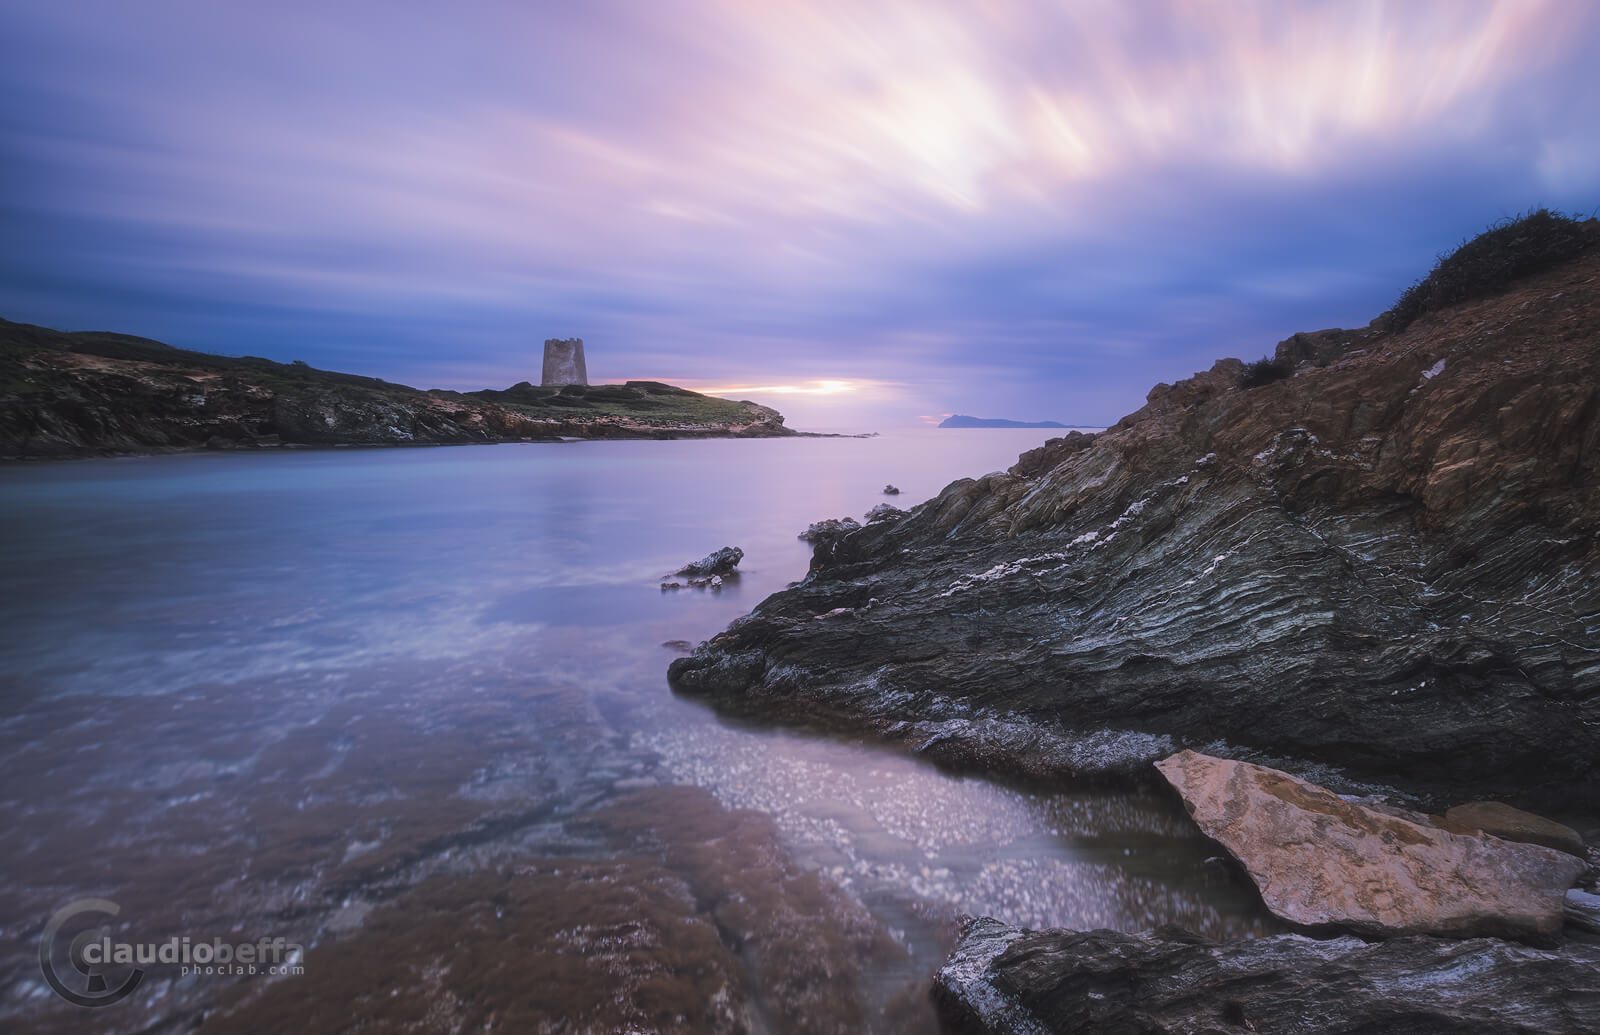 Secret cove, sardinia, italy, landscape, seascape, sea, tower, cove, sunset, blue hour, rocks, transparency, reflections